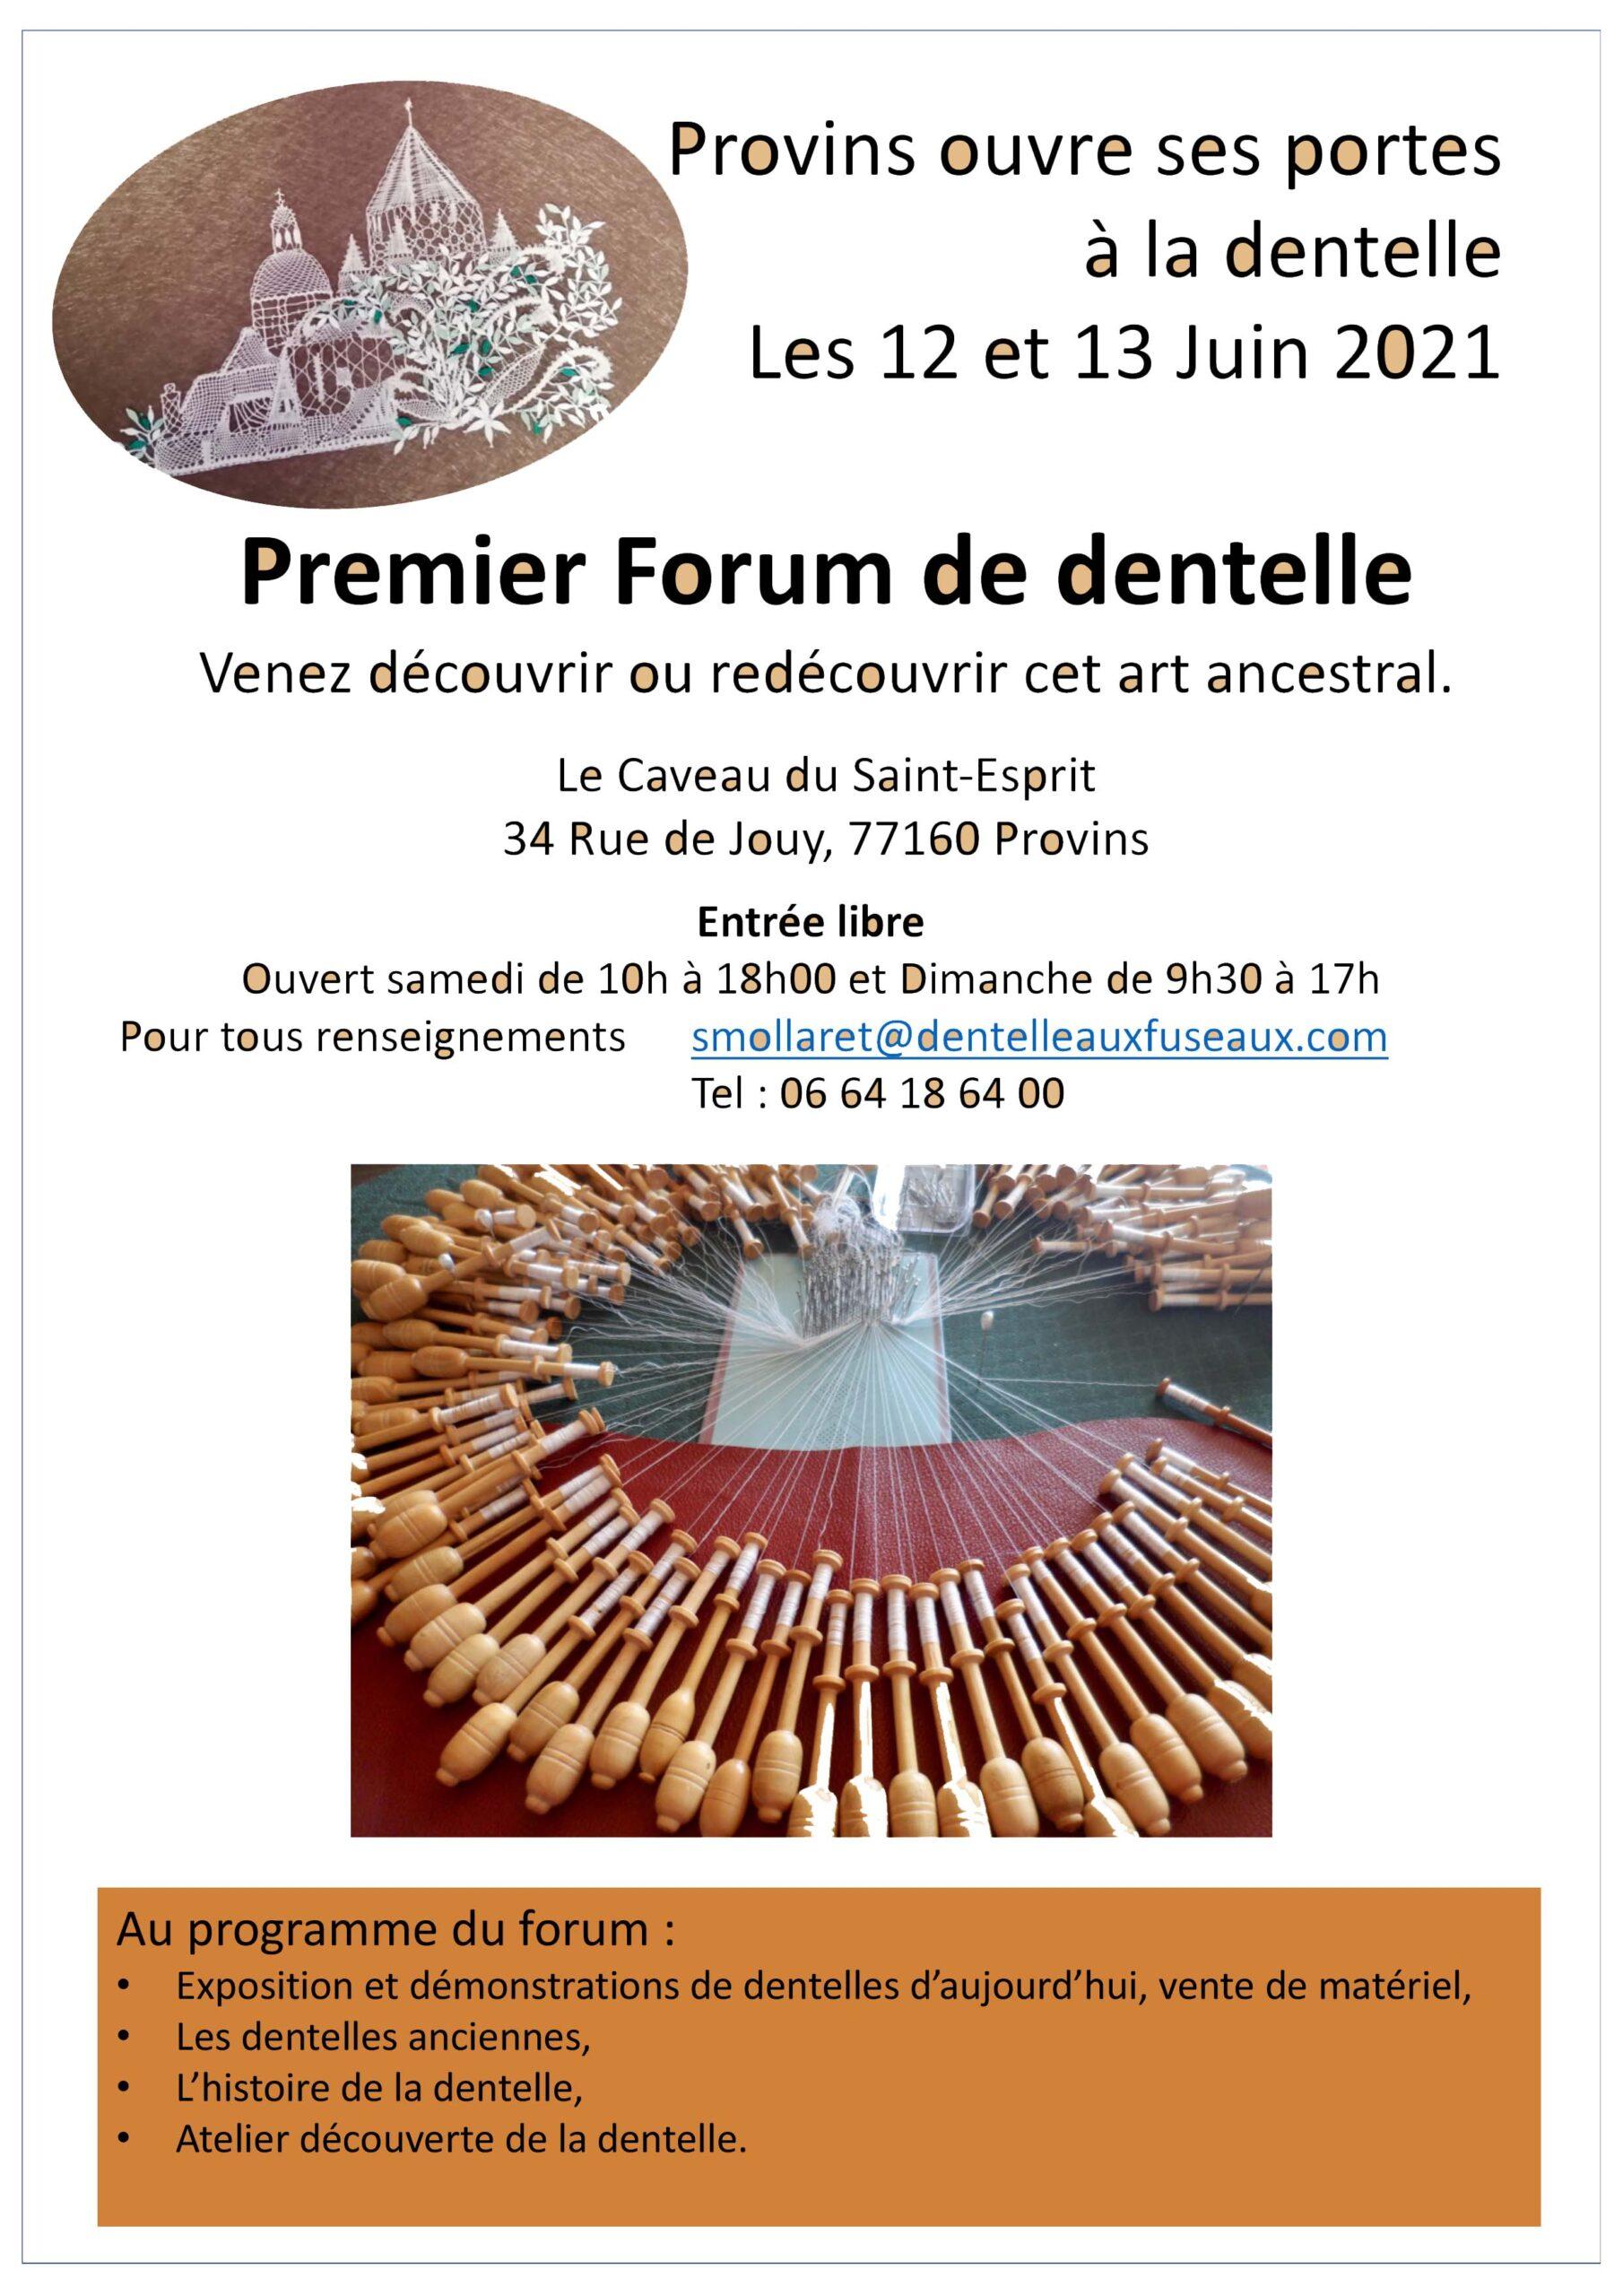 forum d dentelle Provins